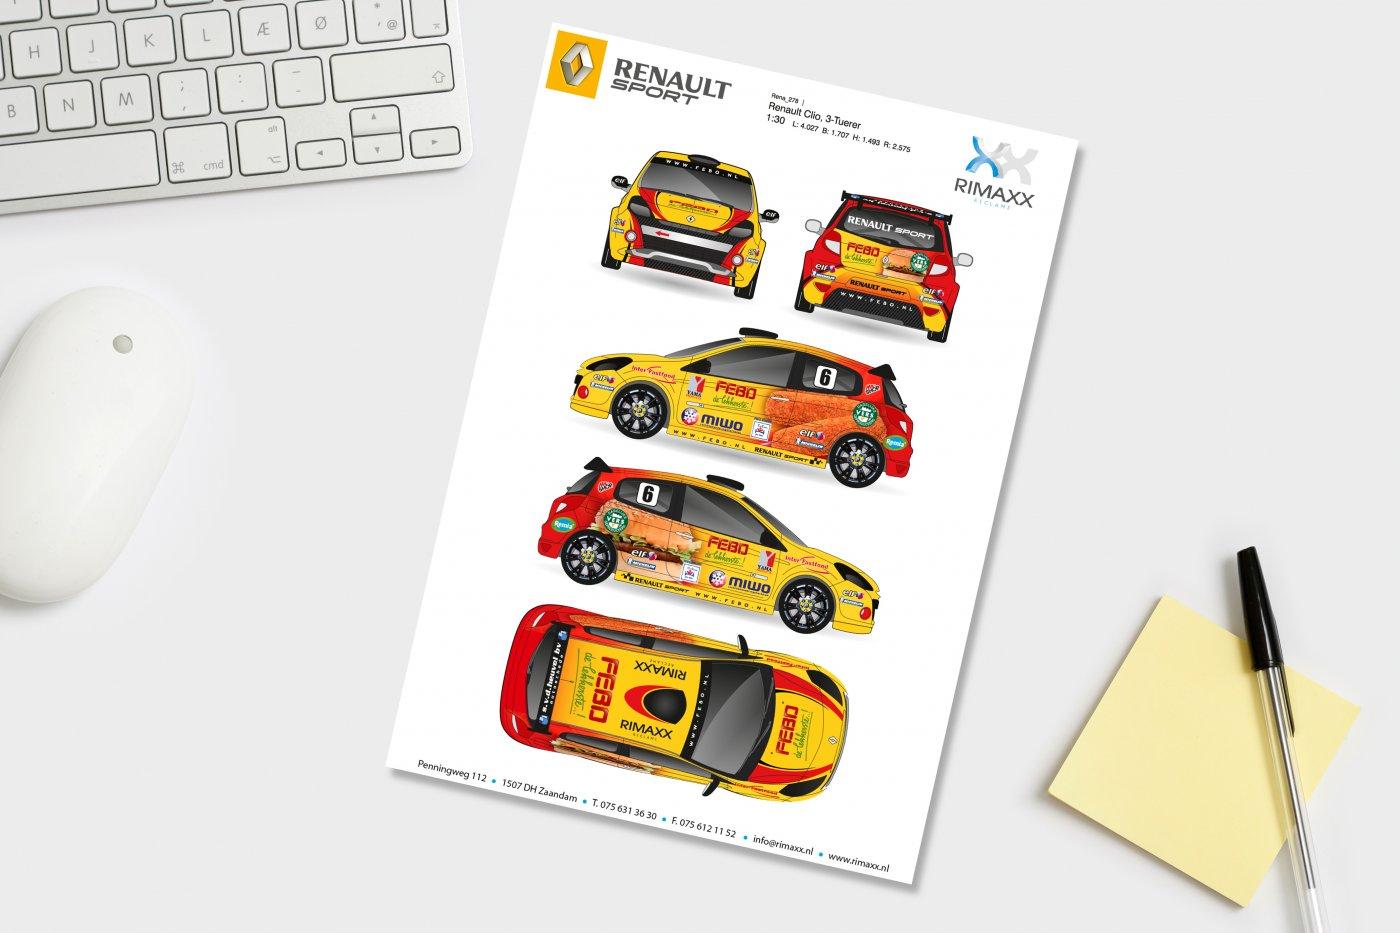 Renault clieo alt test